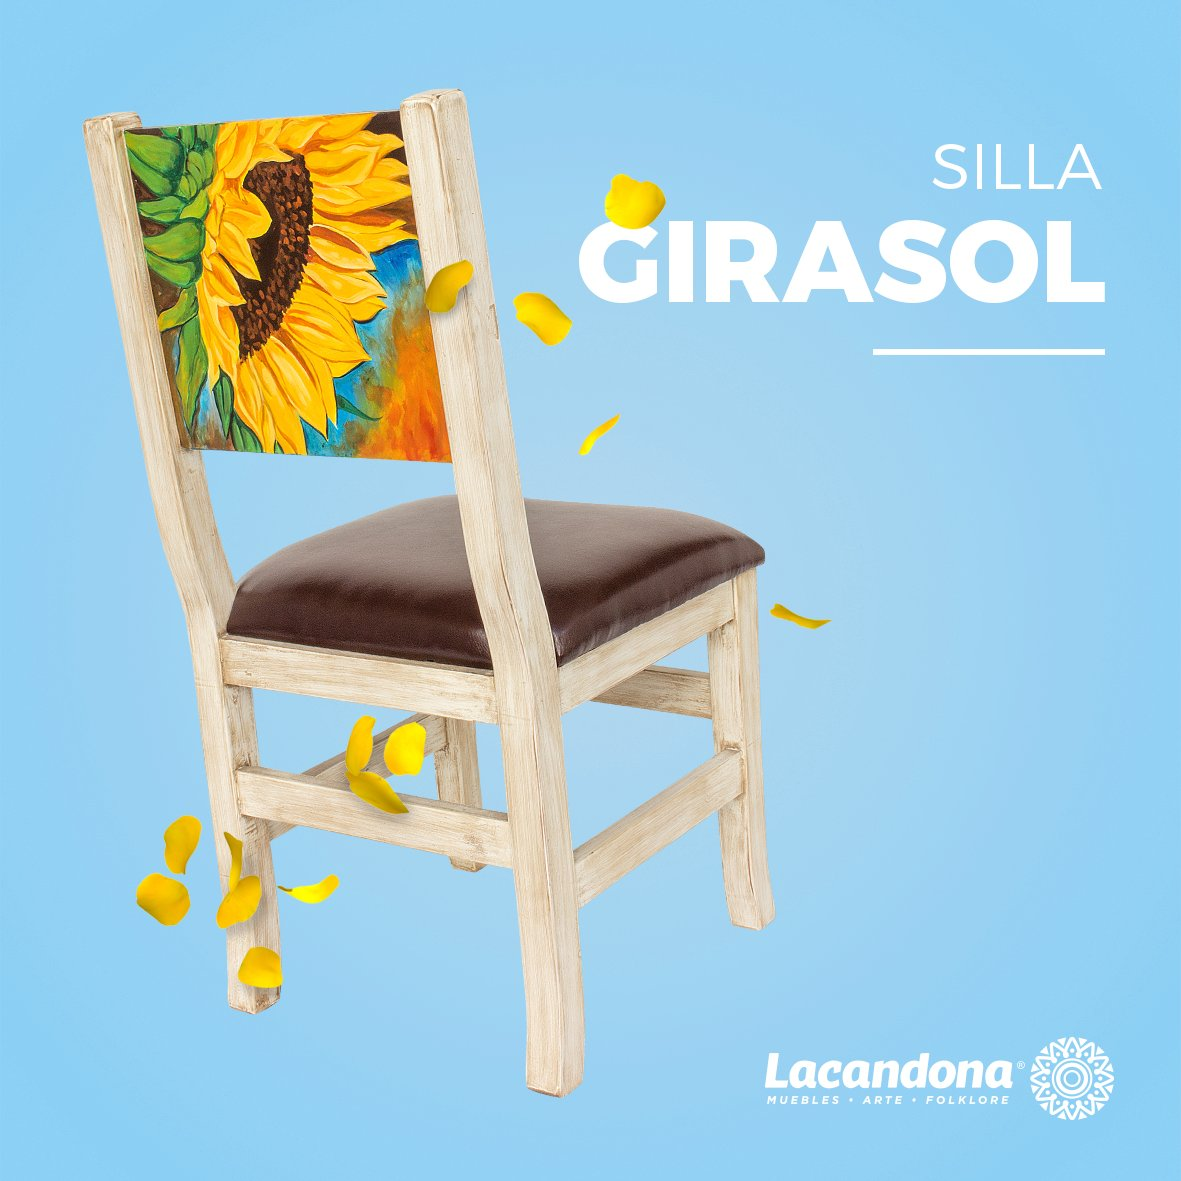 Muebles Lacandona On Twitter Nuestro Modelo Silla Girasol Est  # Muebles Lacandona